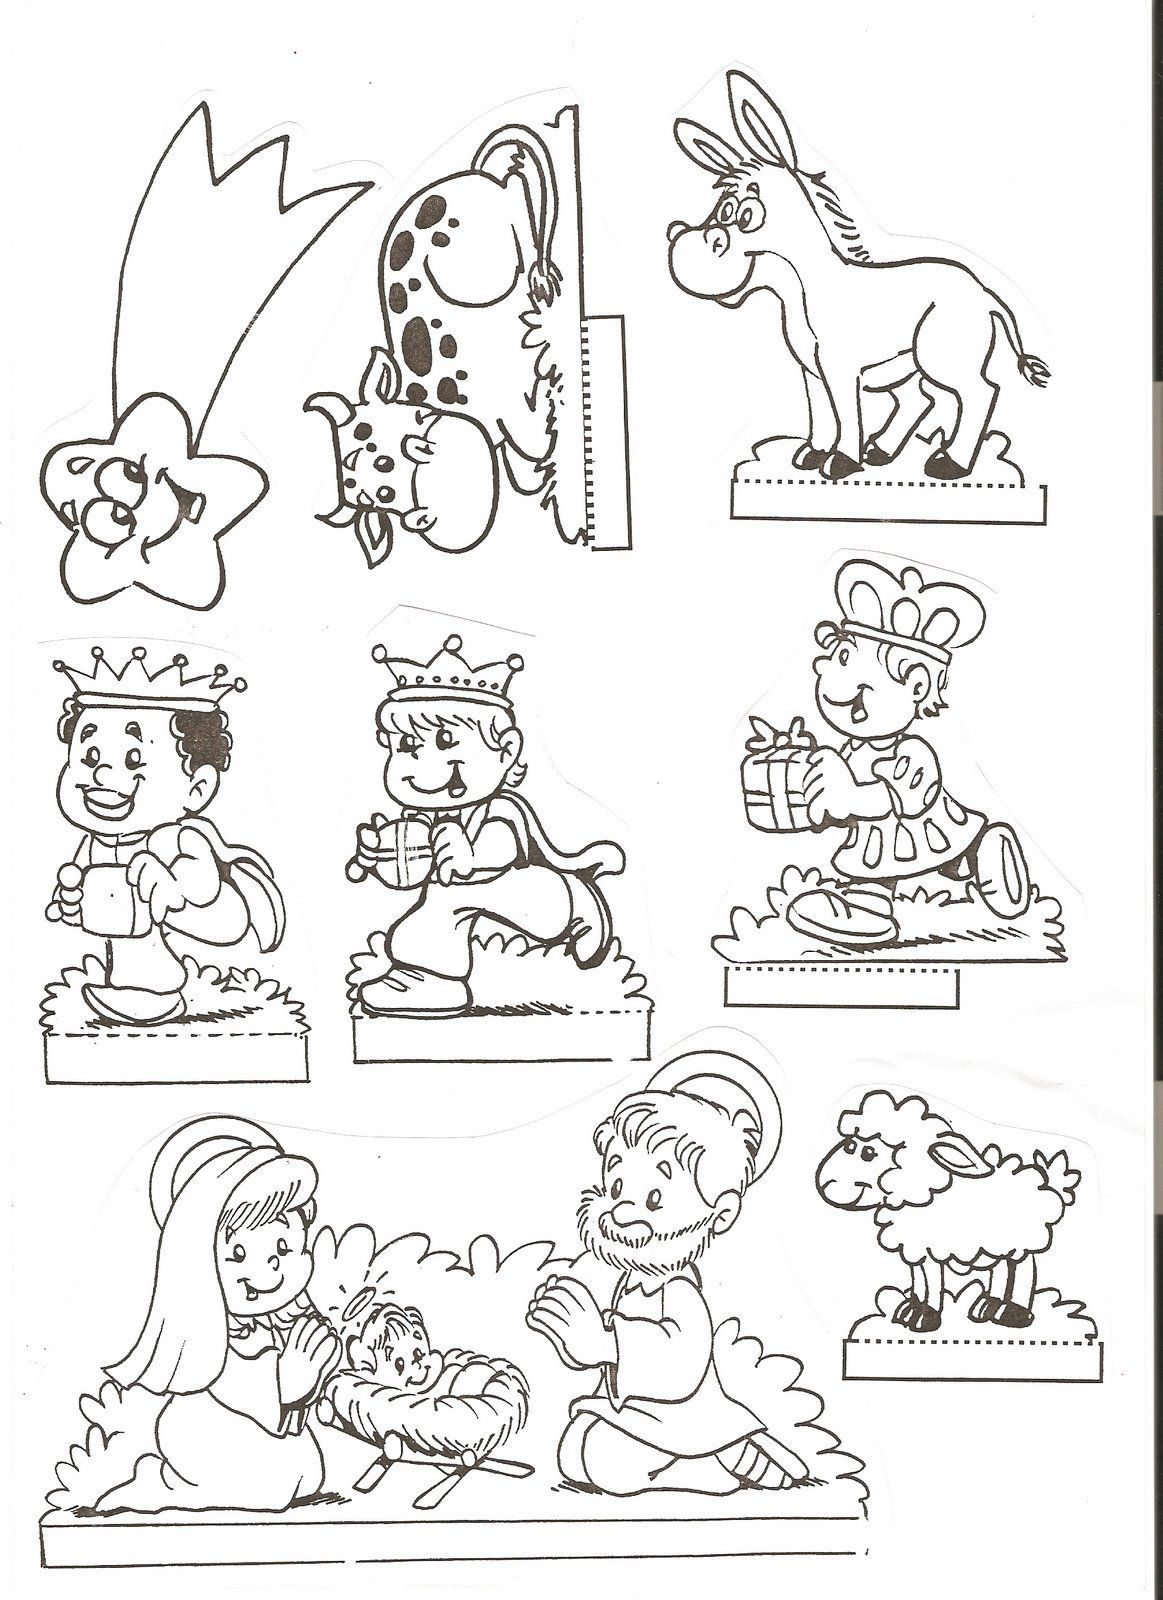 RECURSOS DE EDUCACION INFANTIL | Navidad | Pinterest | Educacion ...